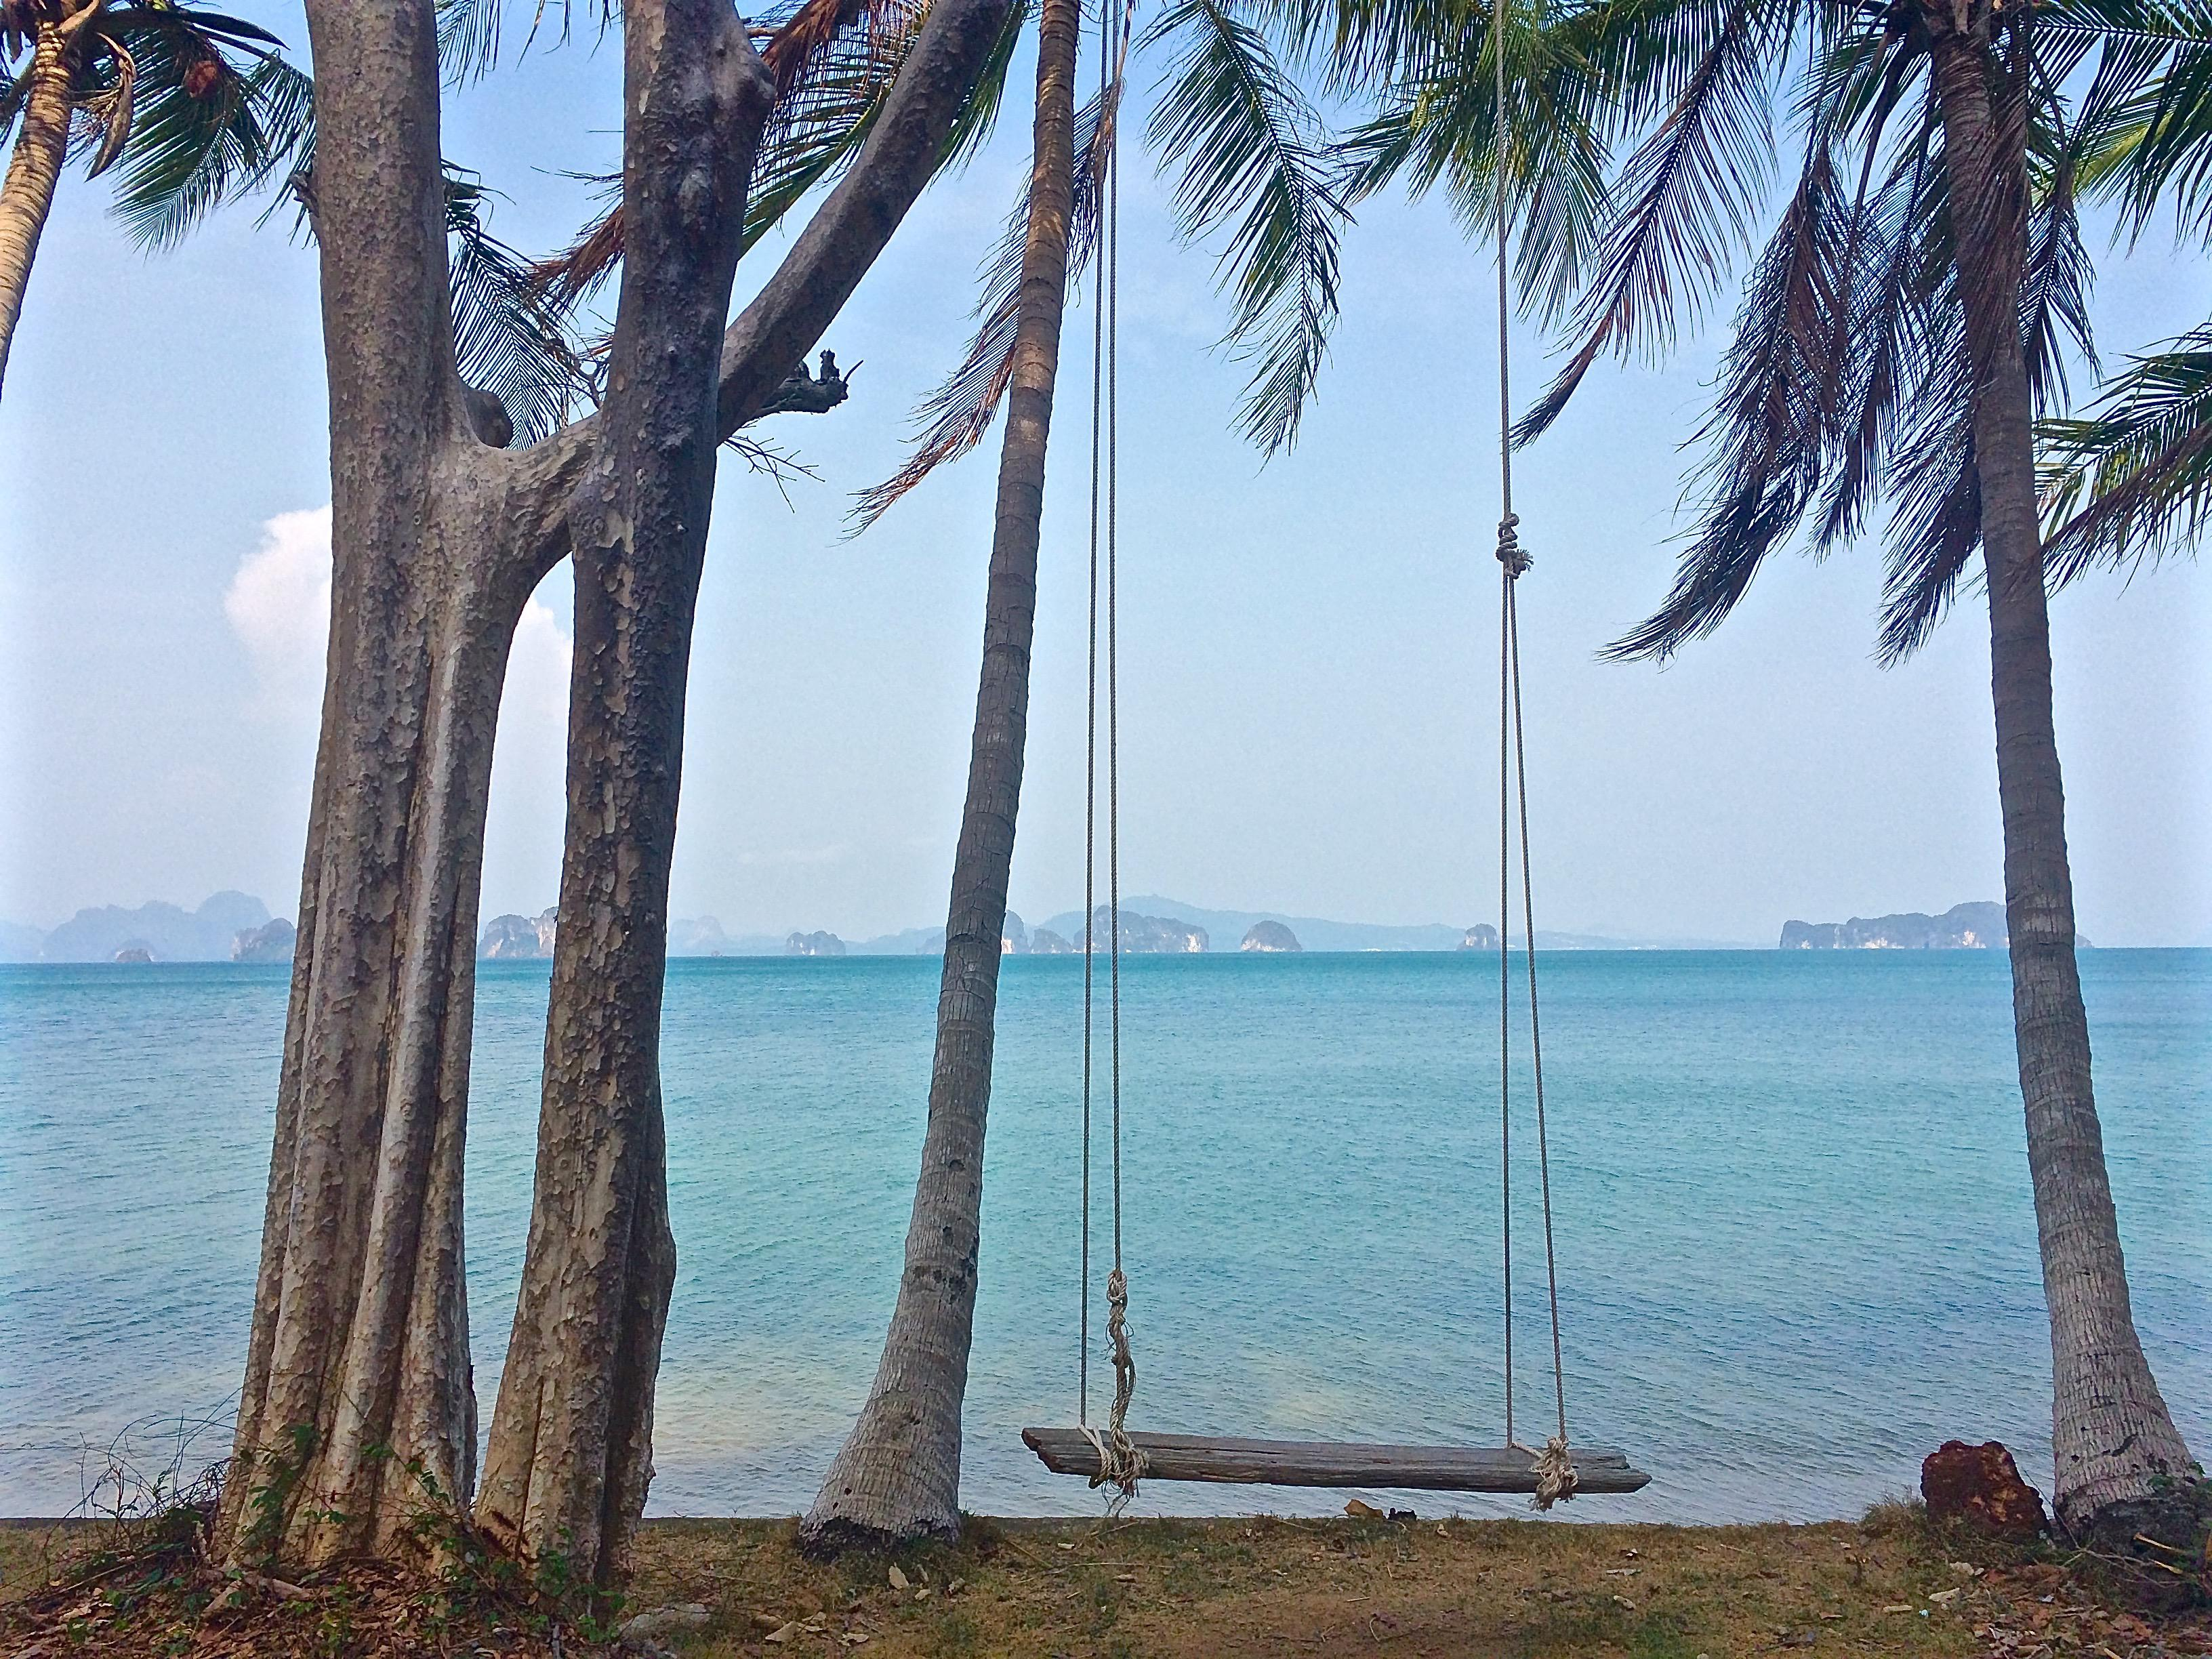 plage koh yao noi, guide de voyage sur la Thaïlande